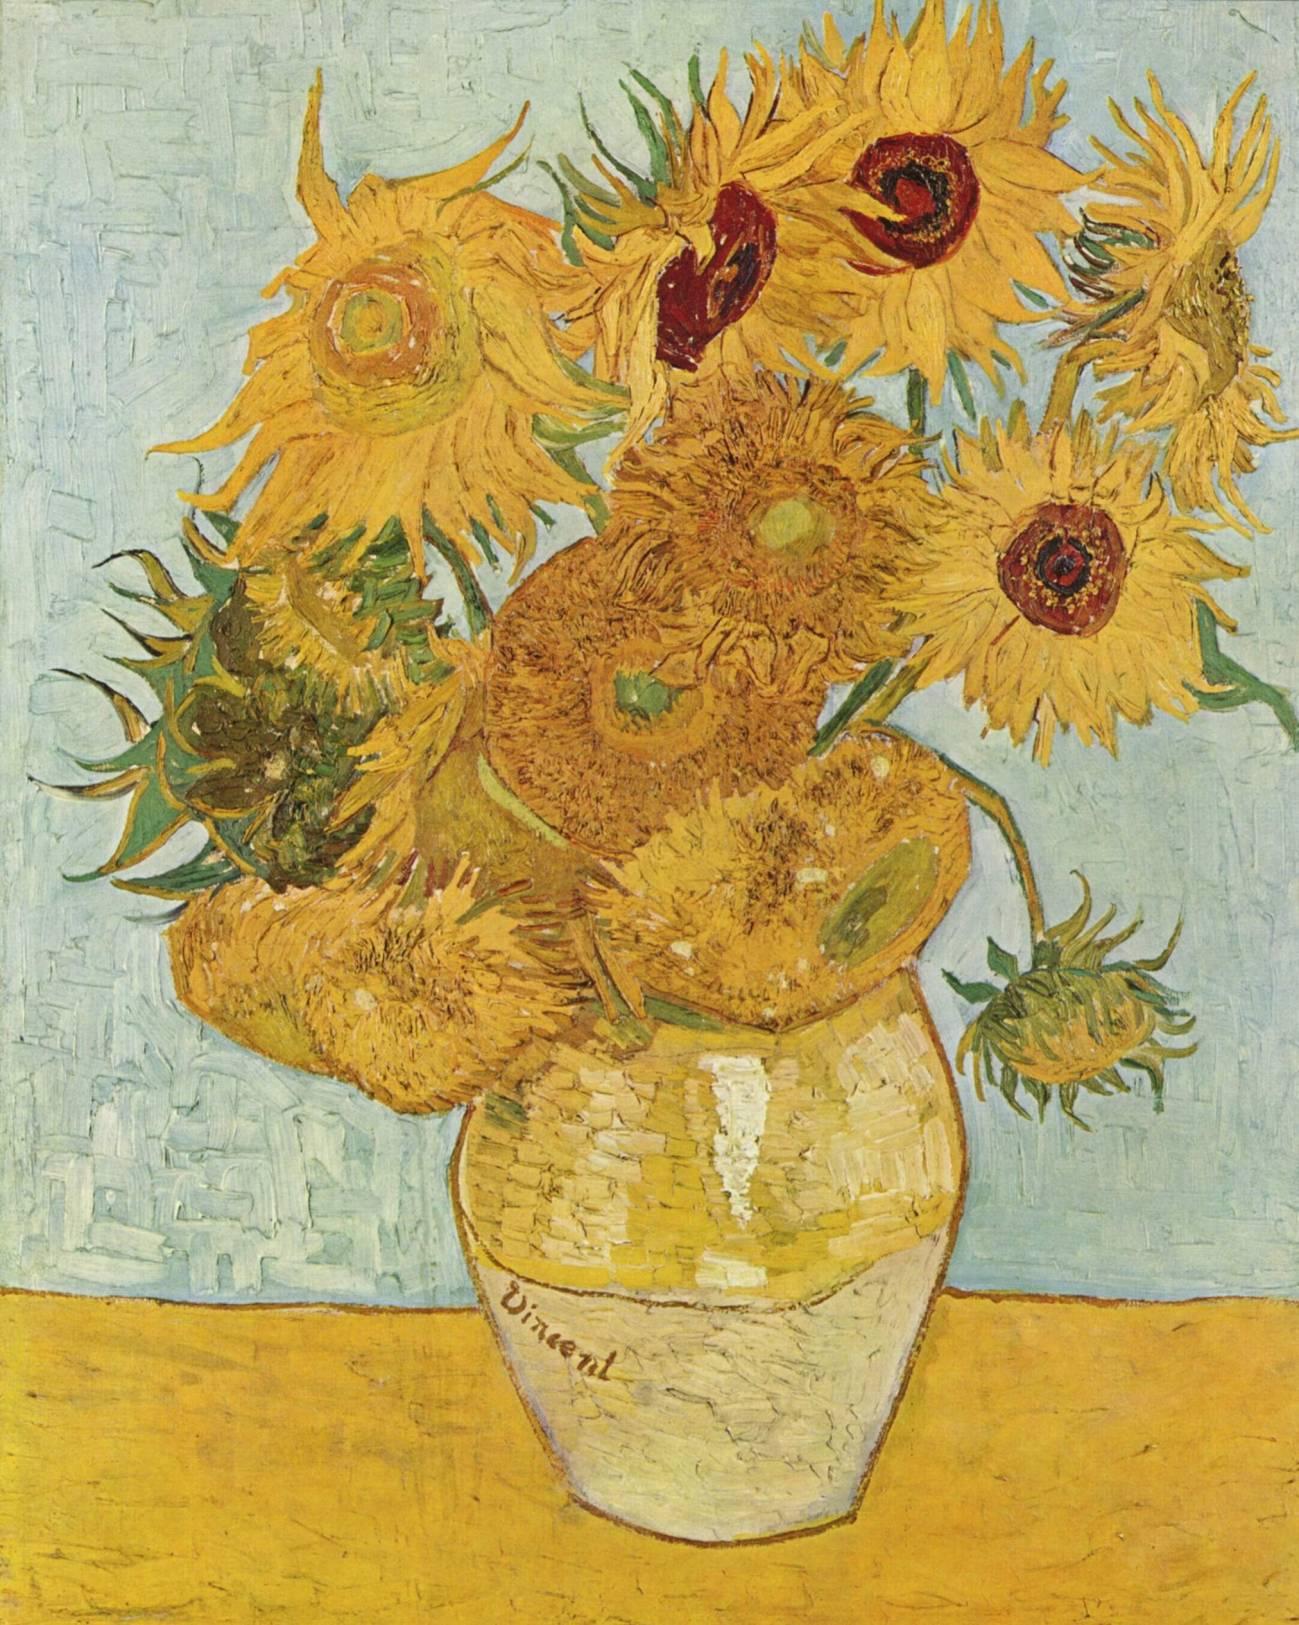 """Jarrón con quince girasoles"" de Vincent van Gogh. Imagen:Wikipedia"